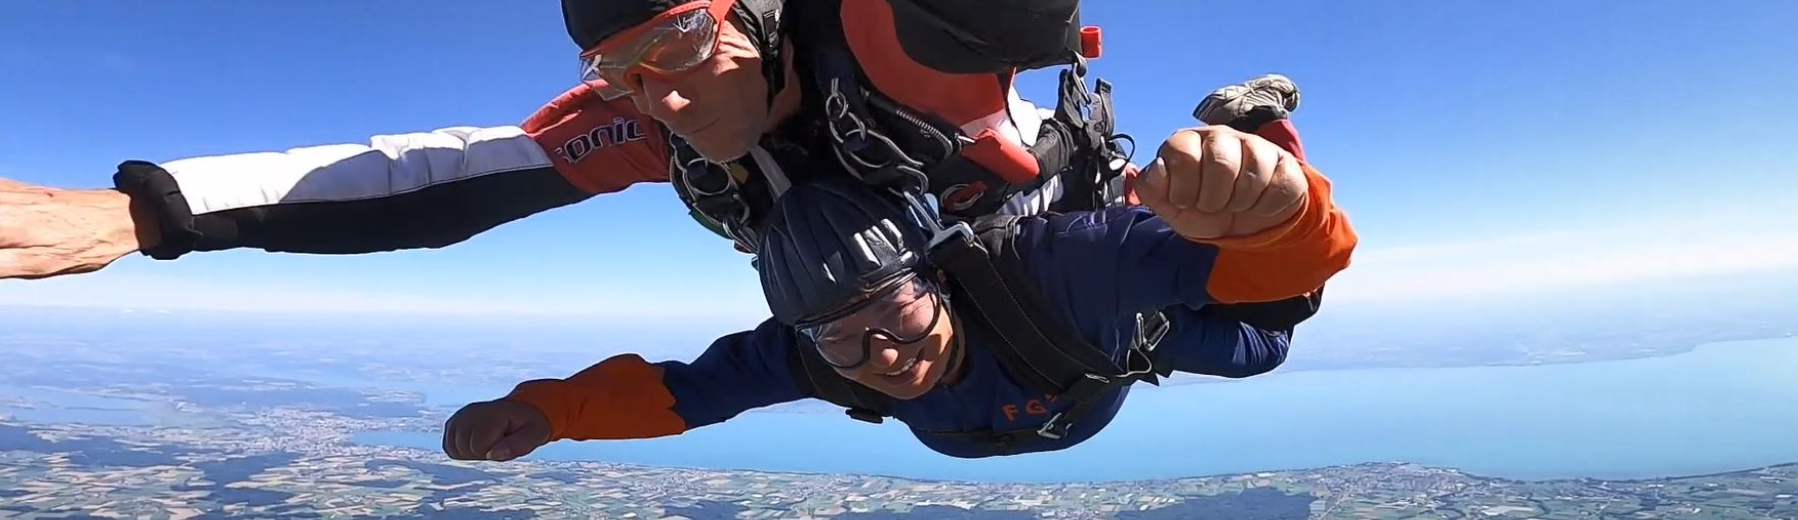 Berti Menz überfüllt sich zum 30-jährigen Firmenjubiläum einen langersehnten Traum - einen Fallschirmsprung